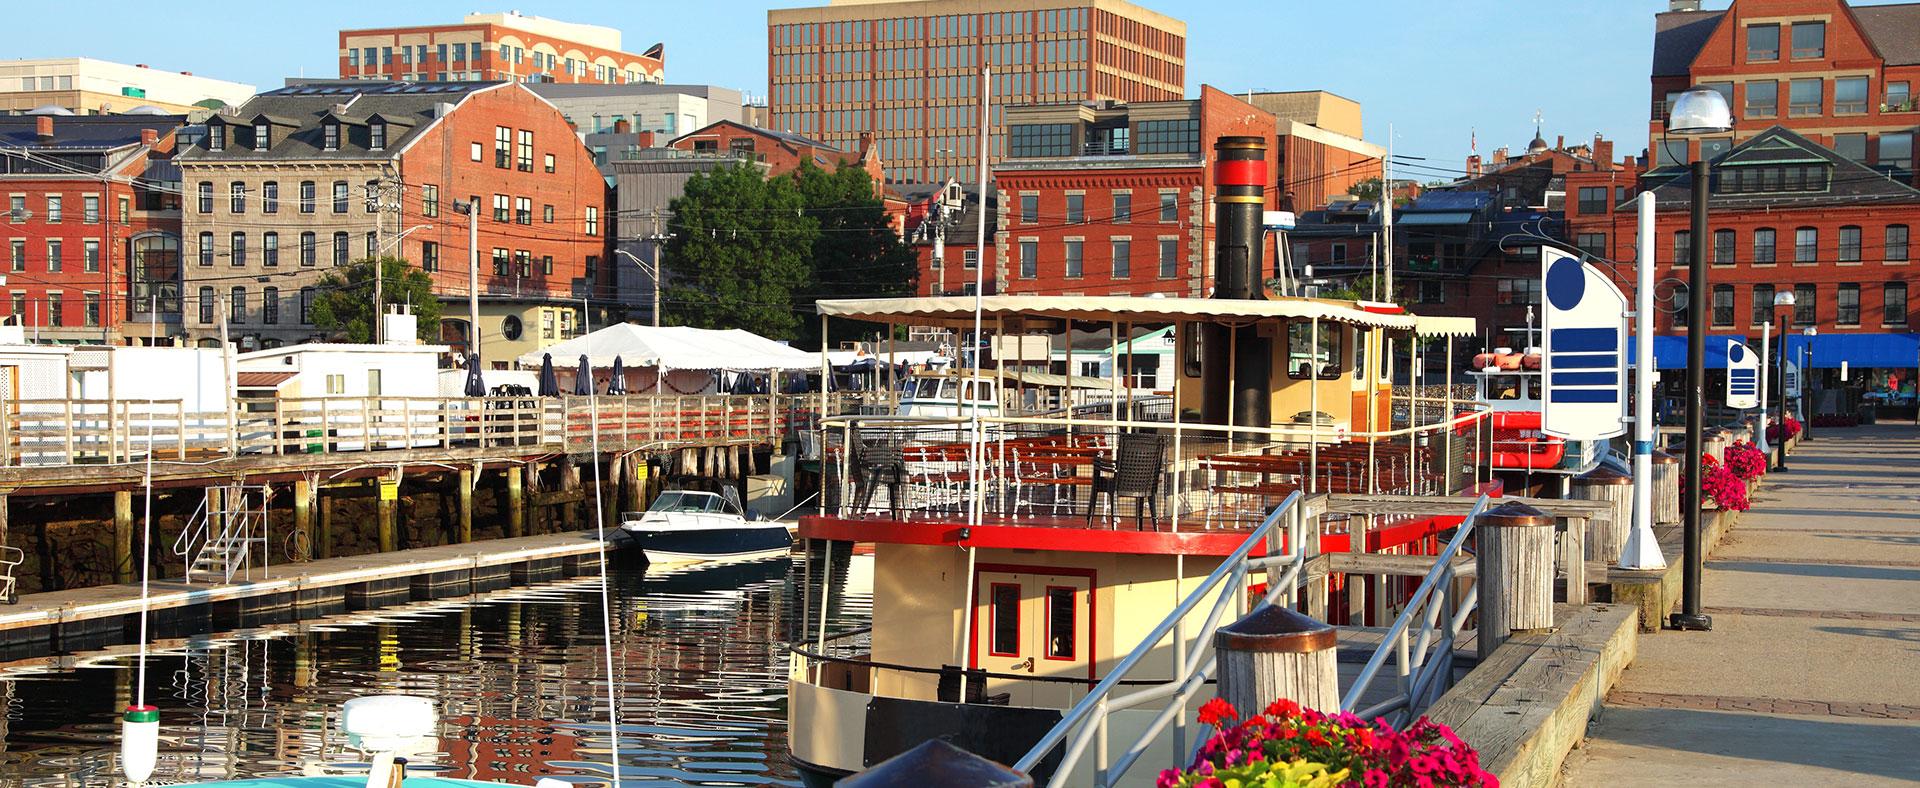 Old Port - Portland, Maine